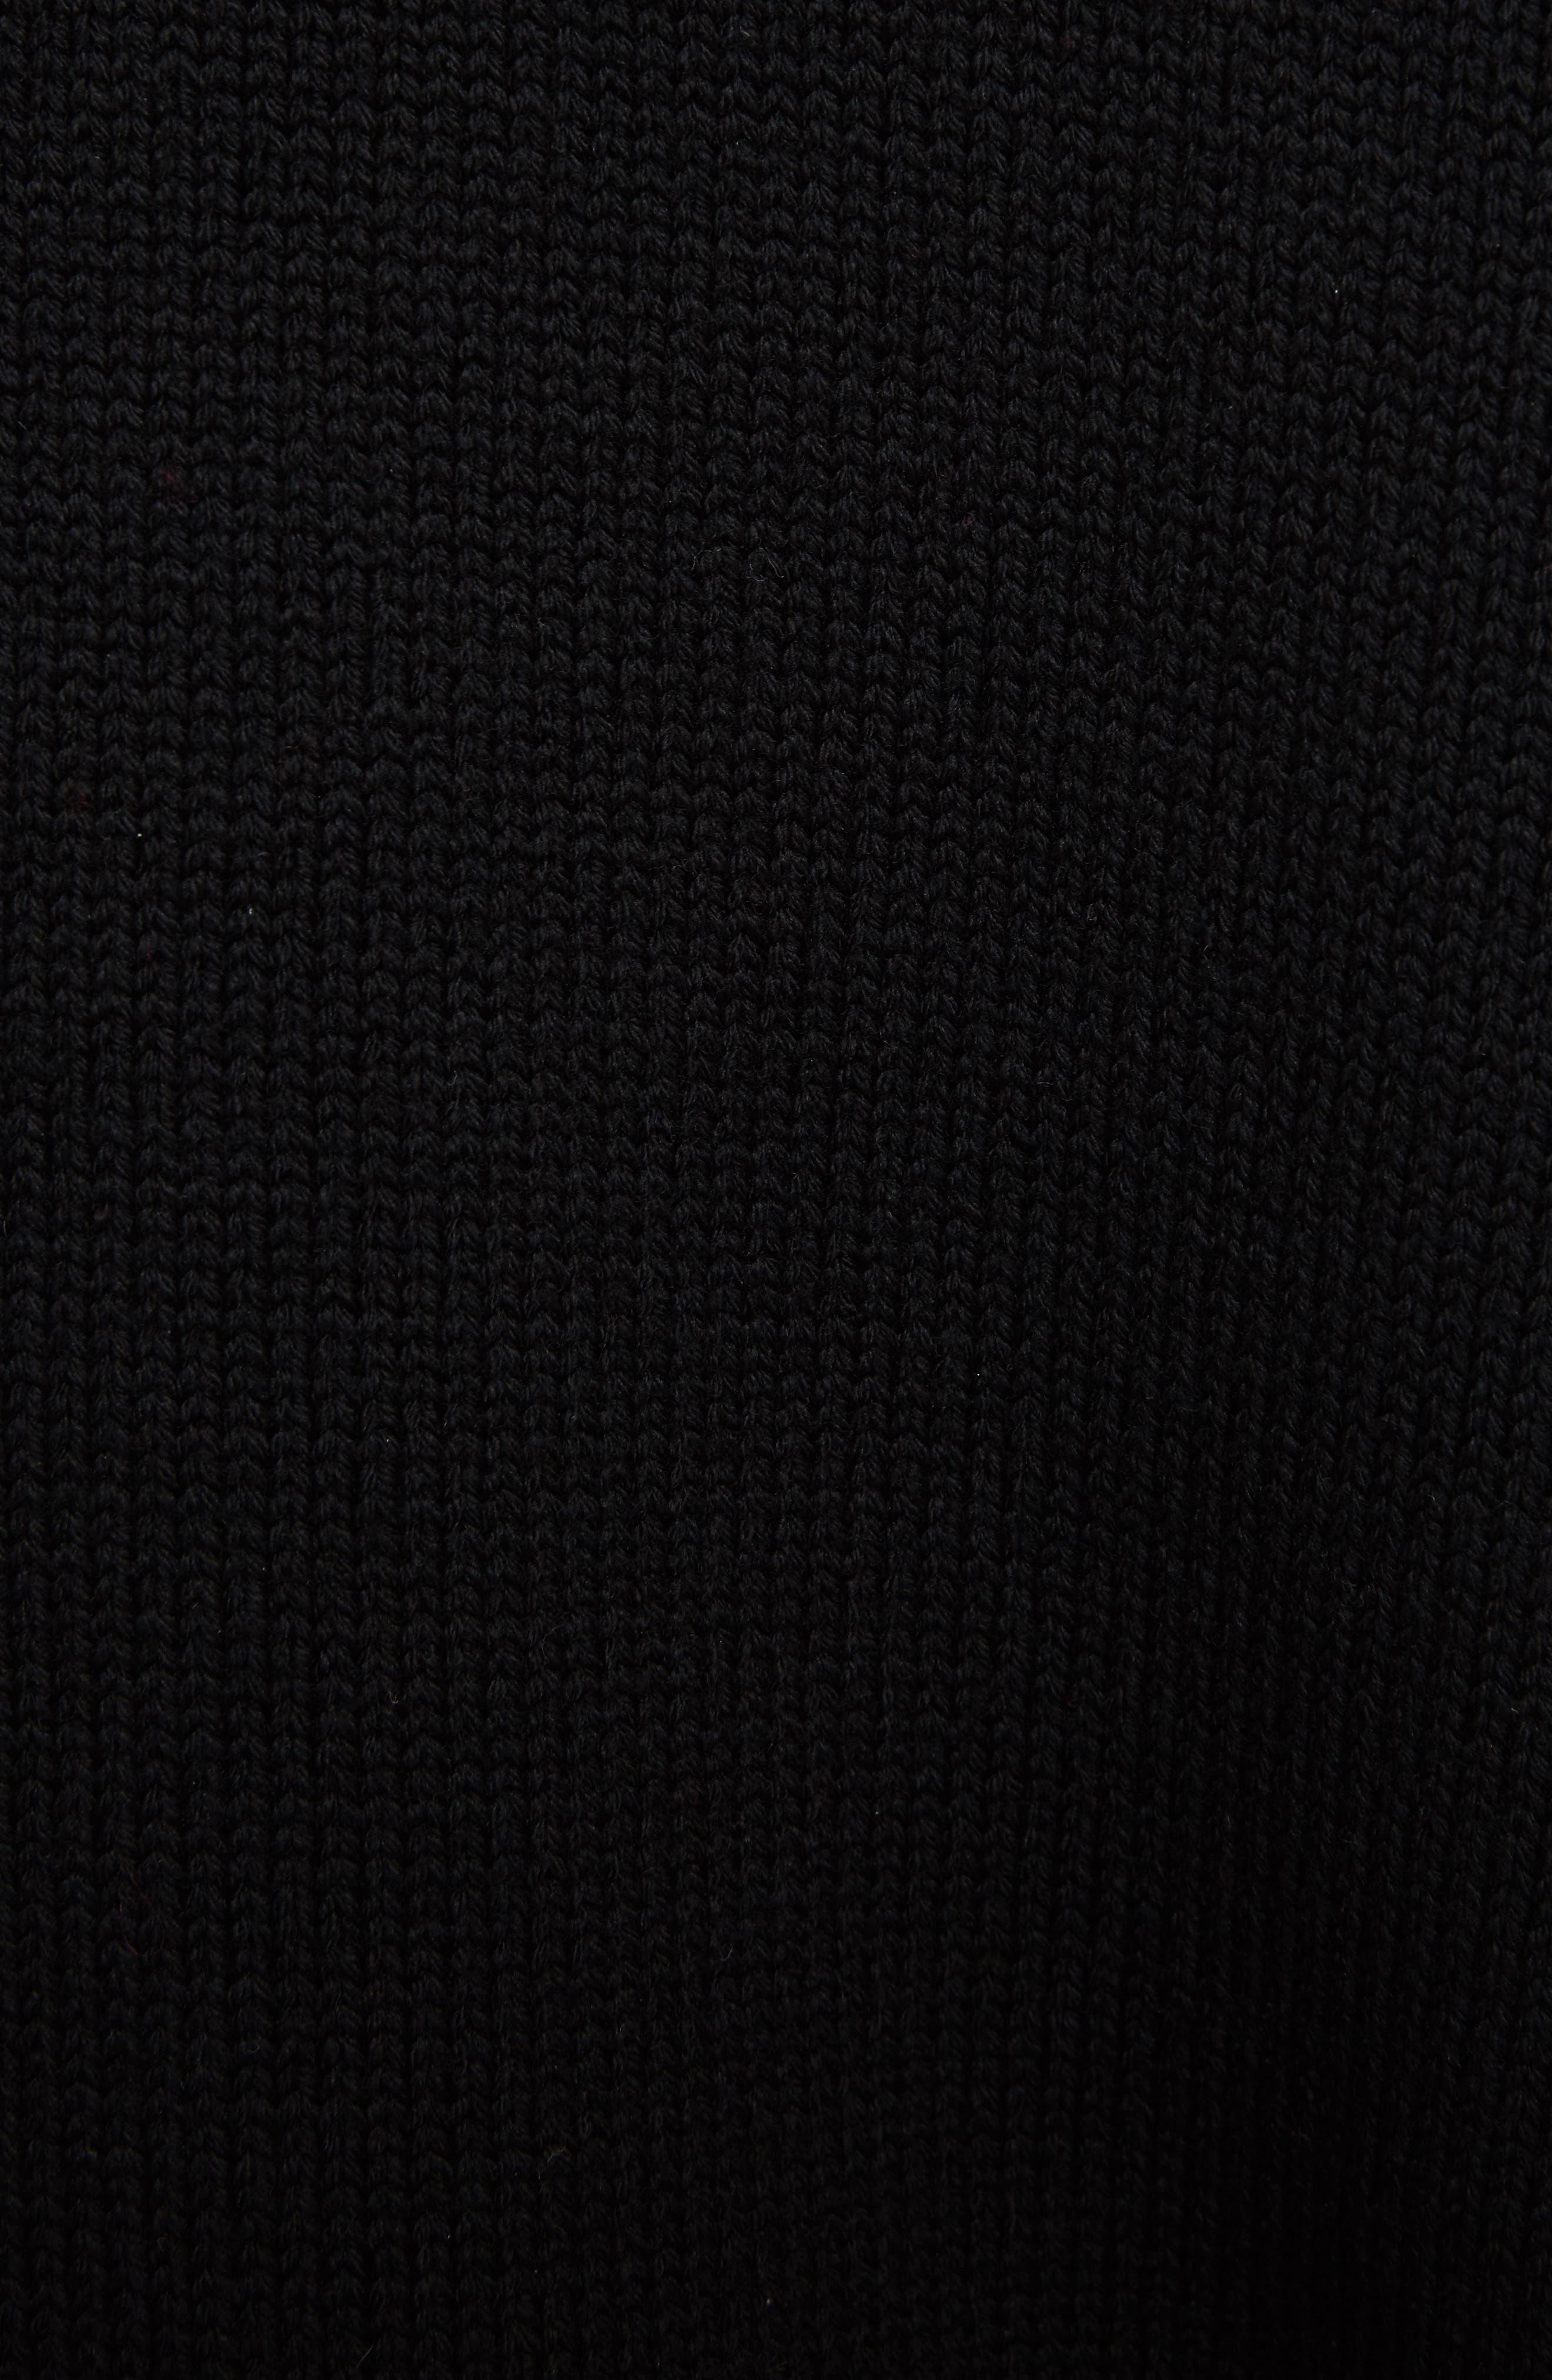 Star Cutout Wool Sweater,                             Alternate thumbnail 5, color,                             Black